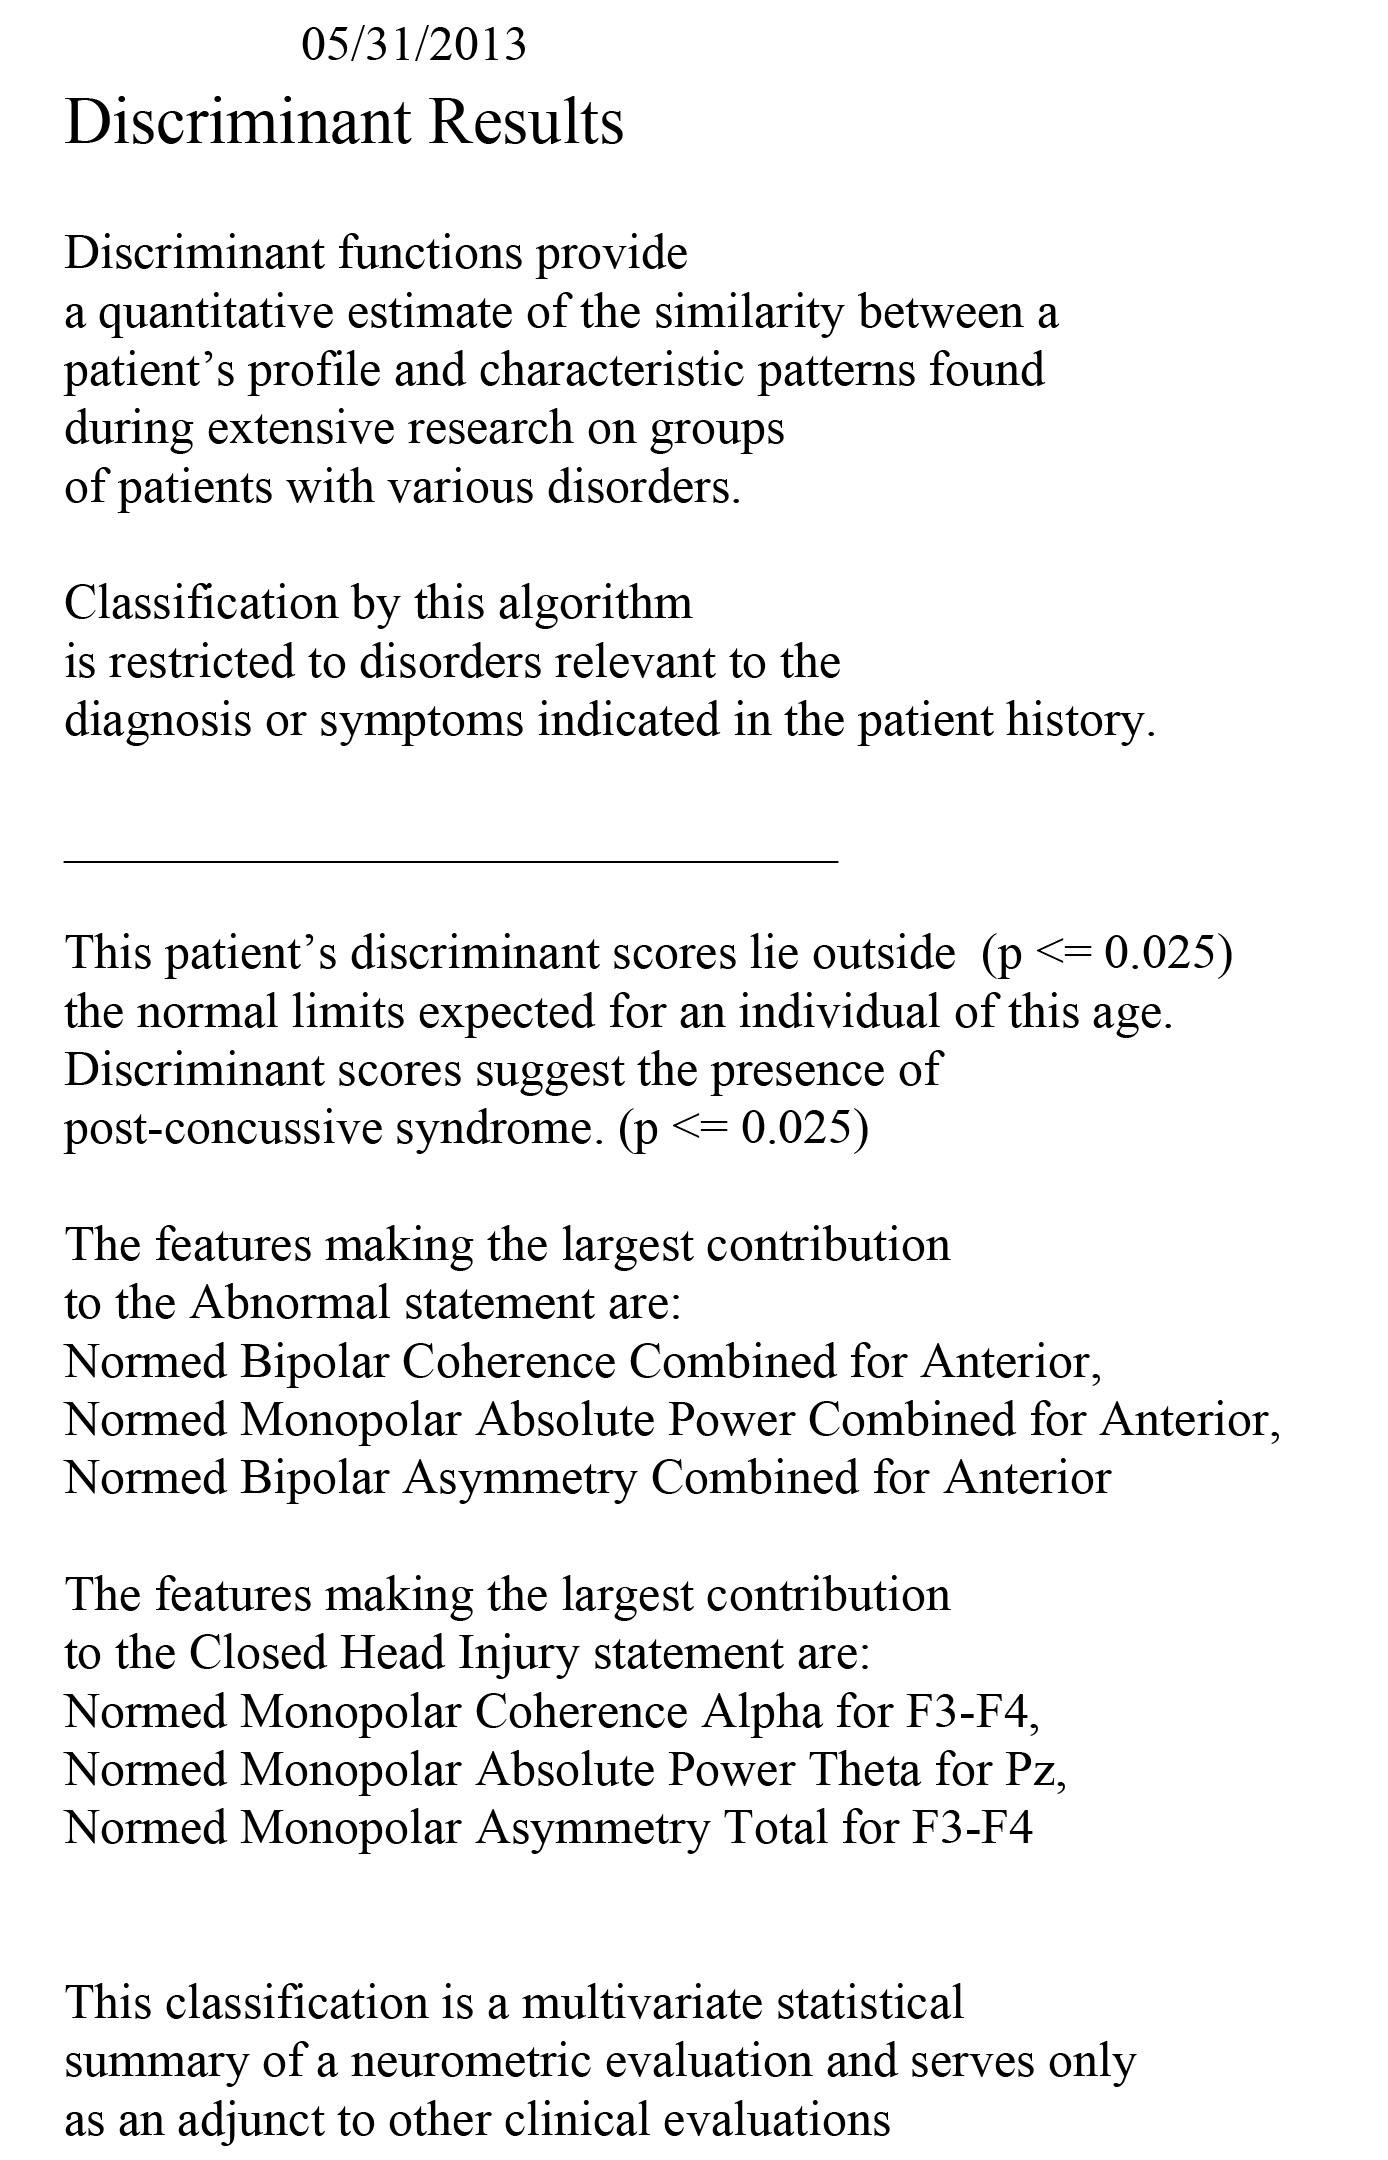 post-concussion syndrome treatment program - scottsdale, Skeleton